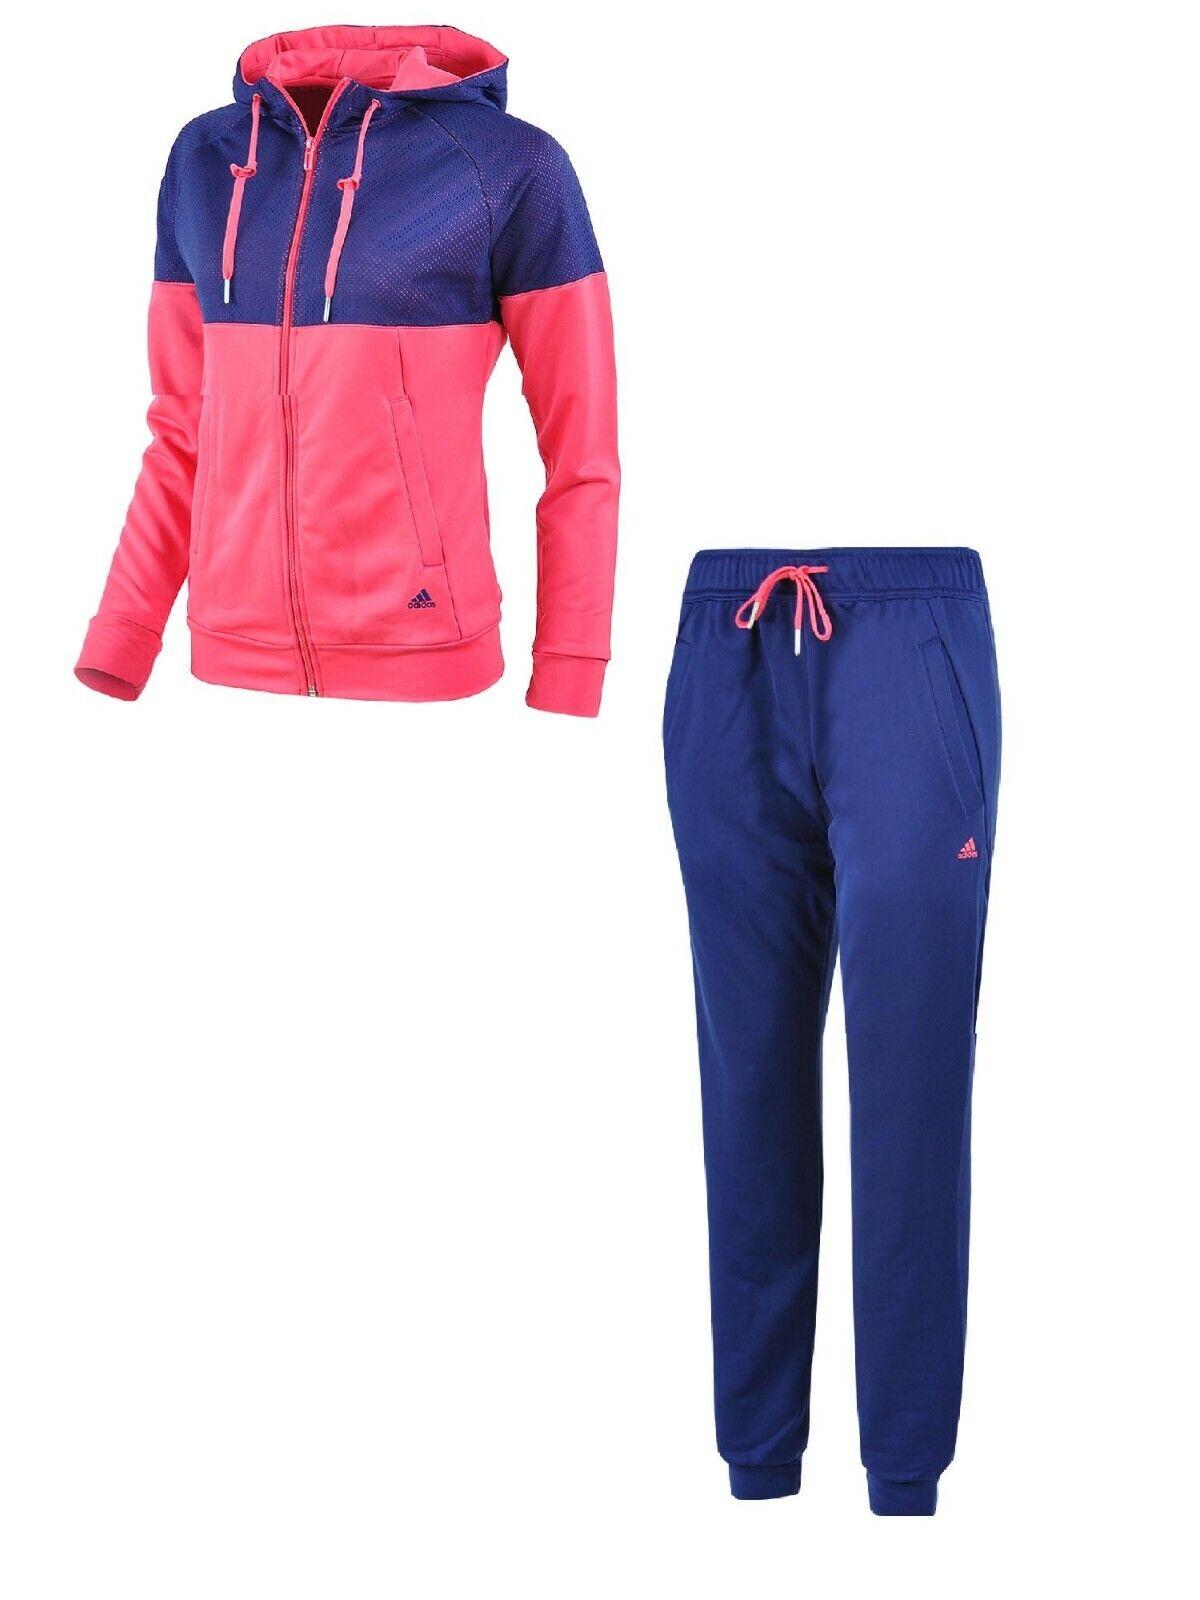 Details zu ADIDAS ClimaLite Damen Trainingsanzug Jogginganzug Sportanzug AB3984 Gr.XS XL